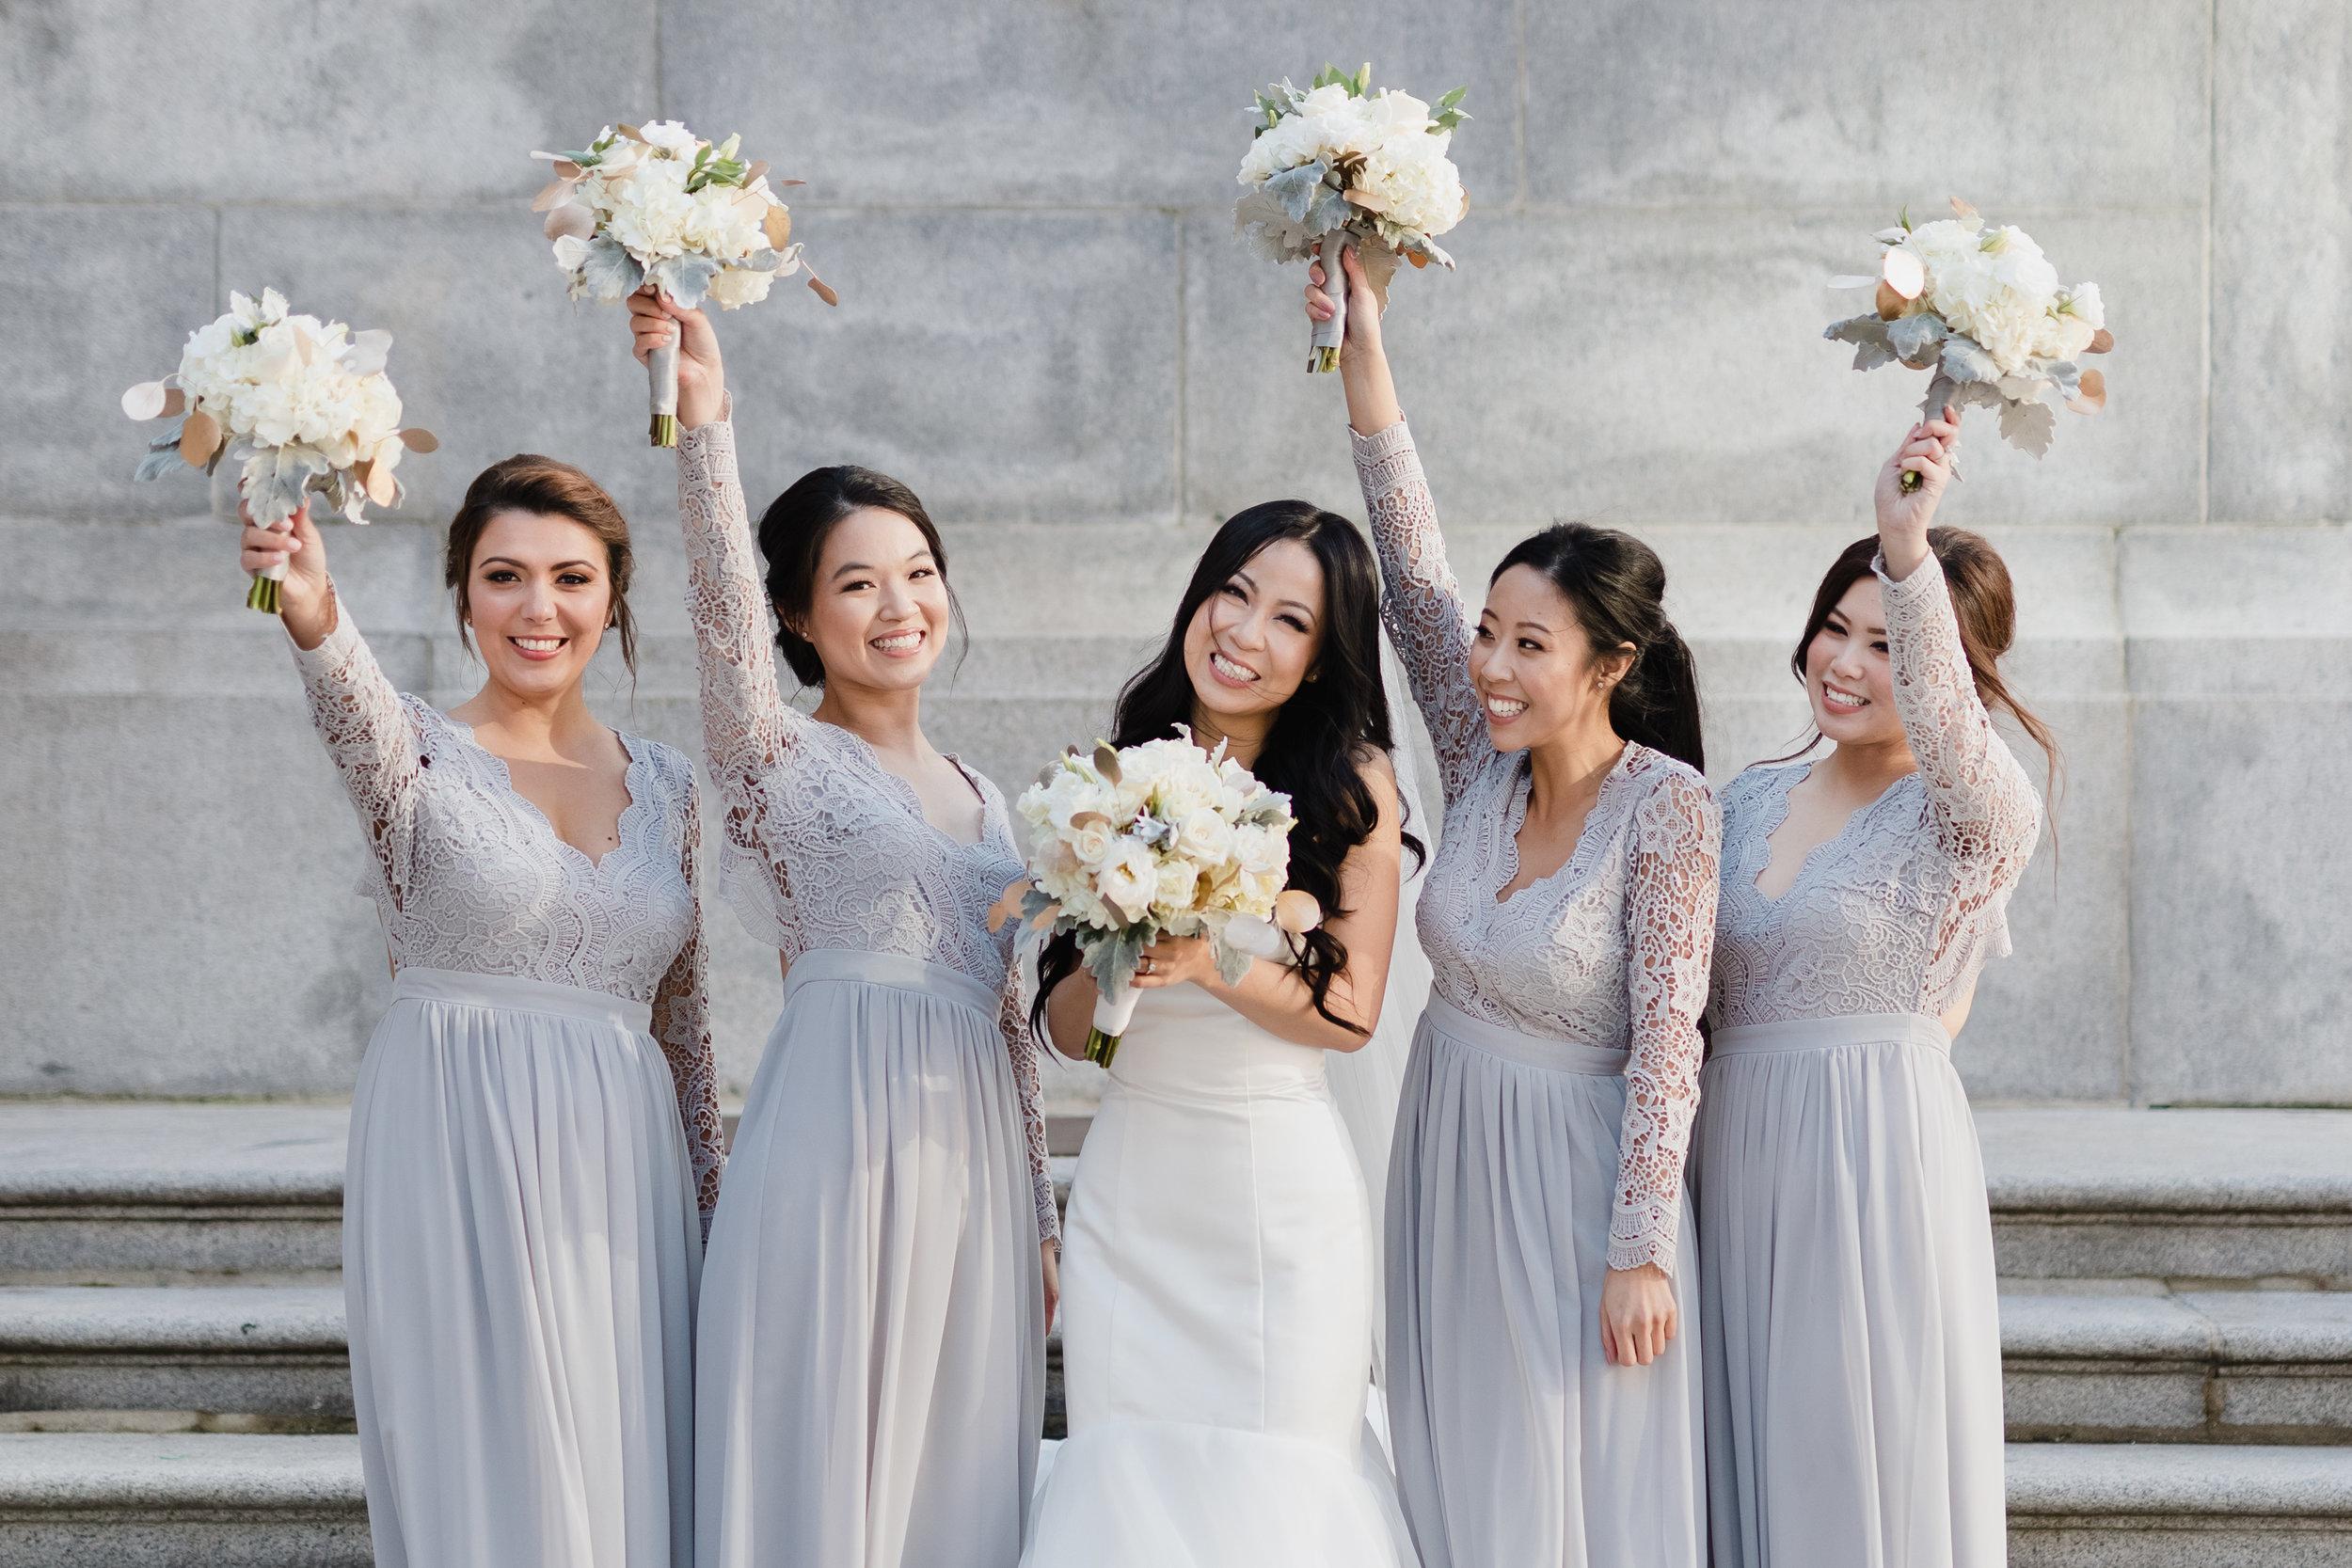 HeraStudios_Selects_Full_KatrinaAndrew_Wedding_Version2-268.jpg